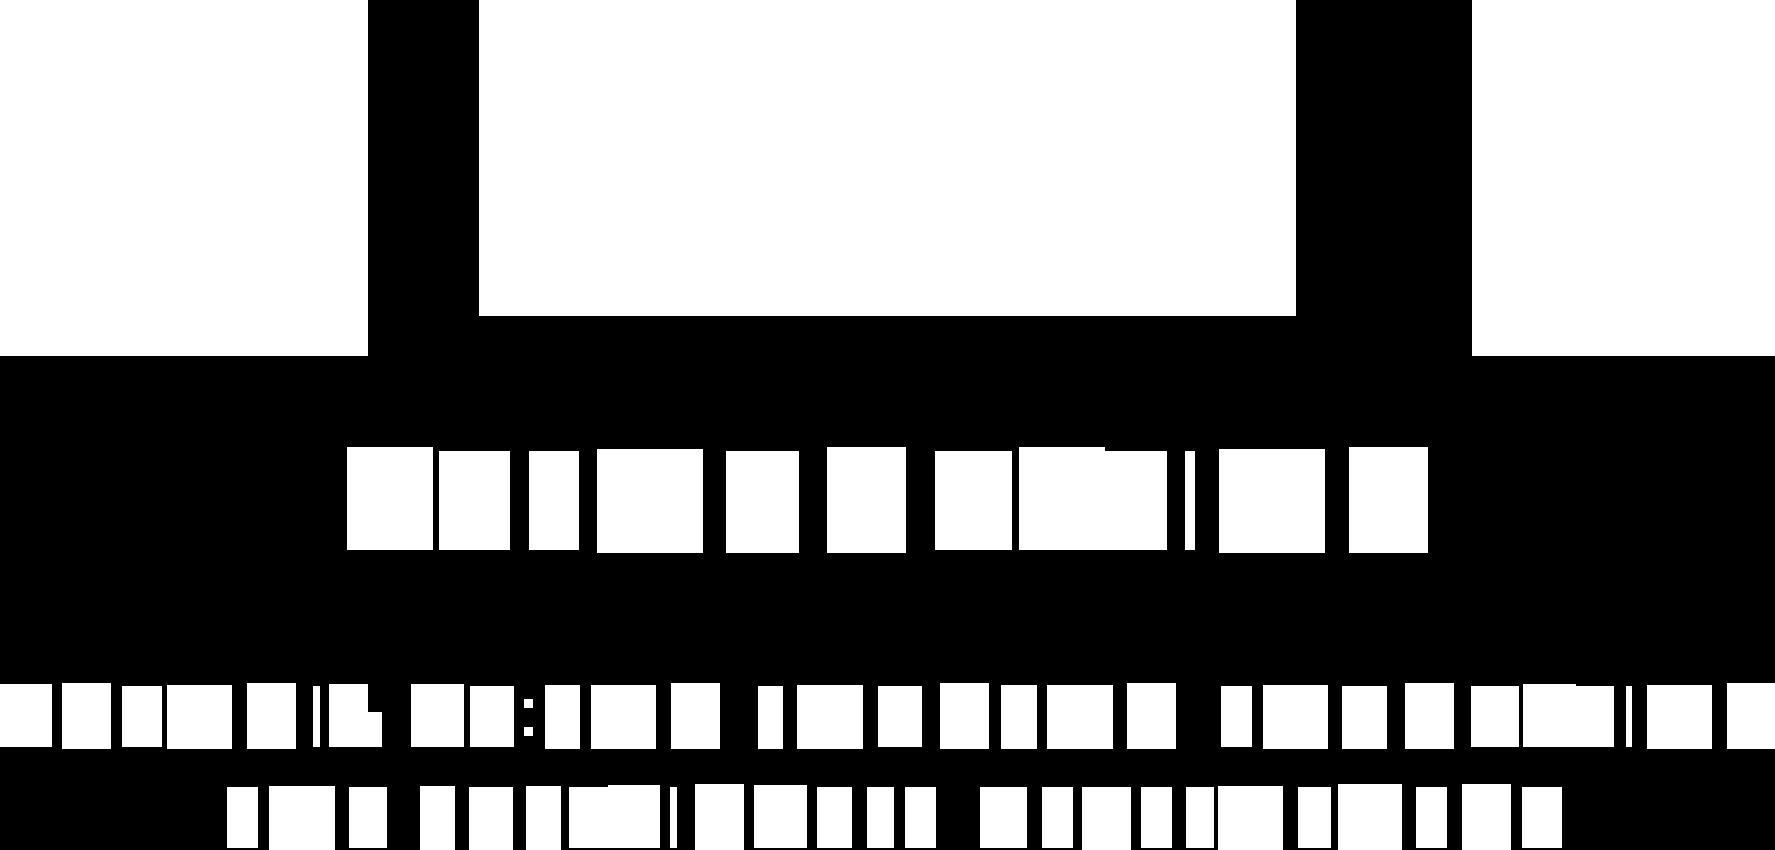 AX-VITlogotyp_mellan.png